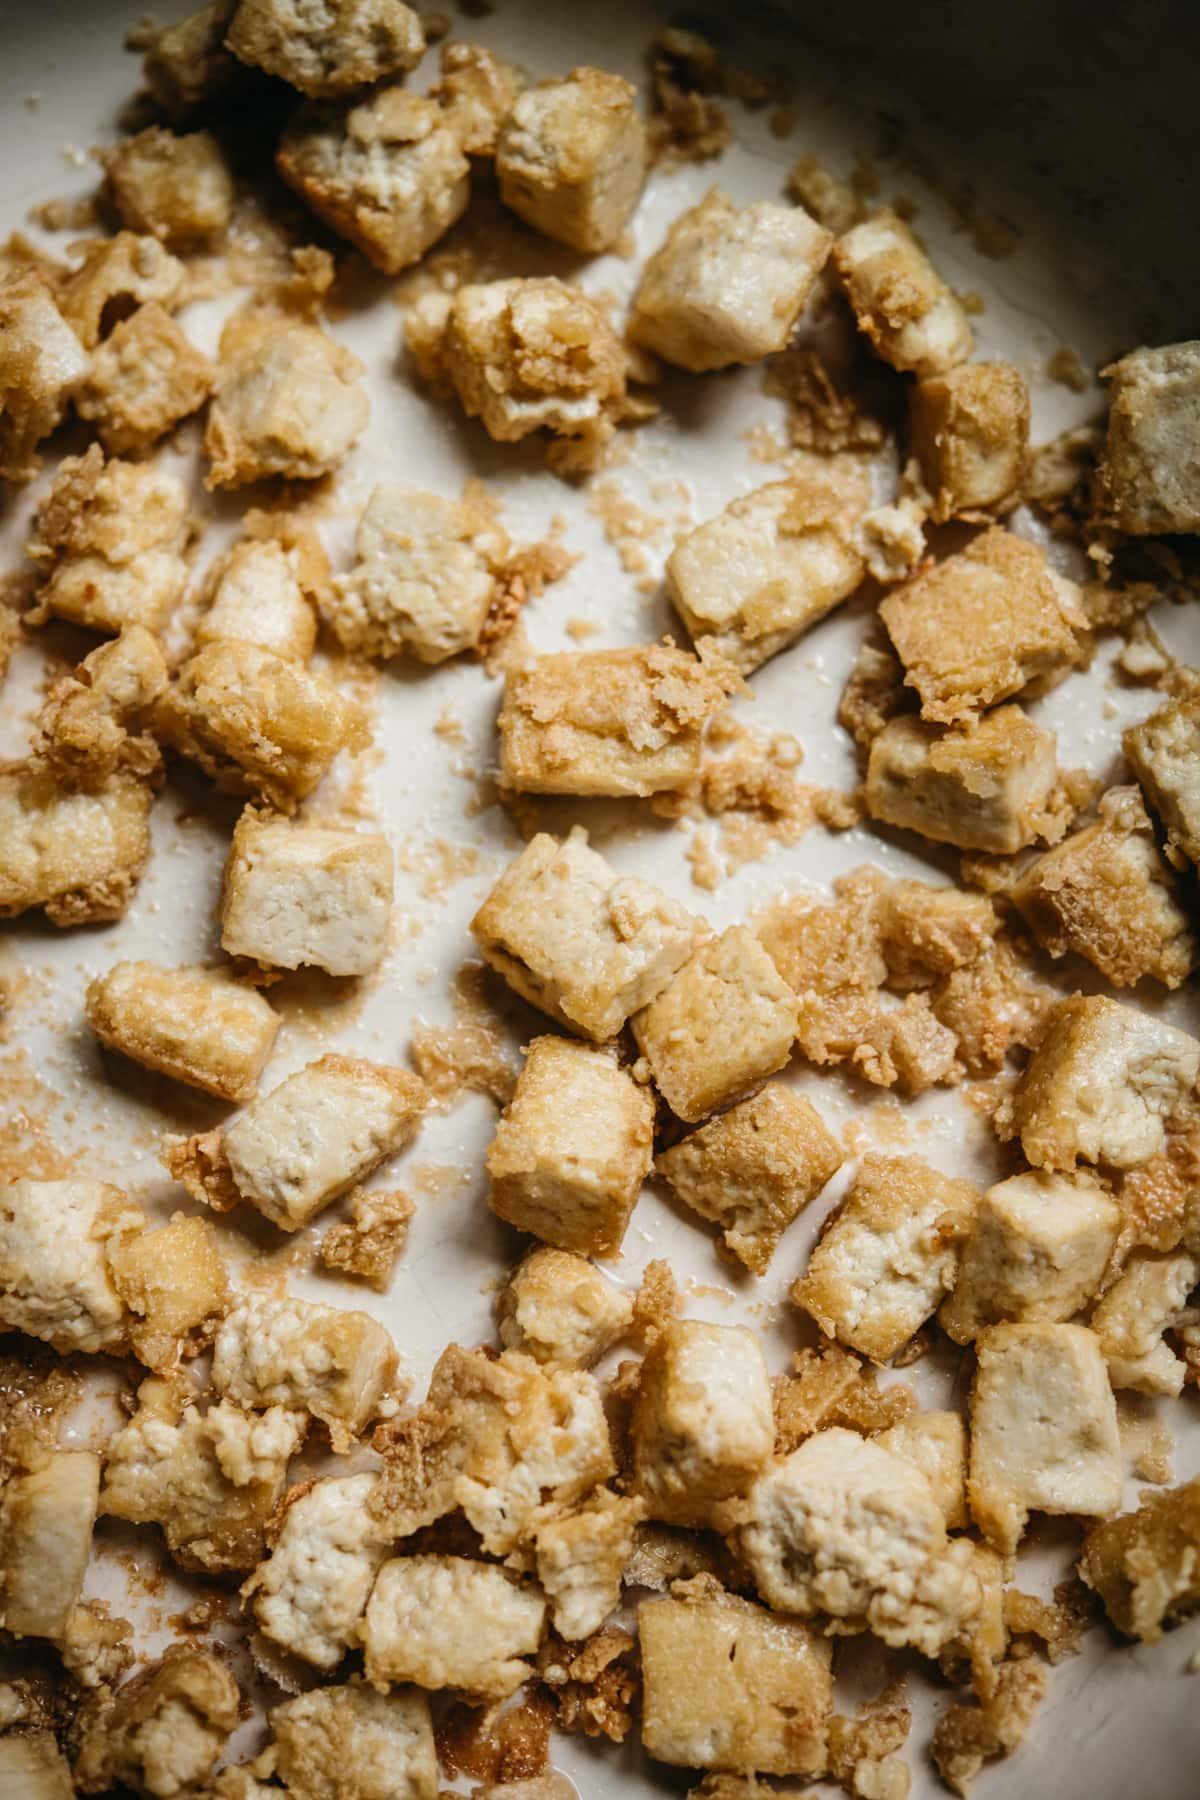 close up view of crispy pan-fried tofu in a pan.